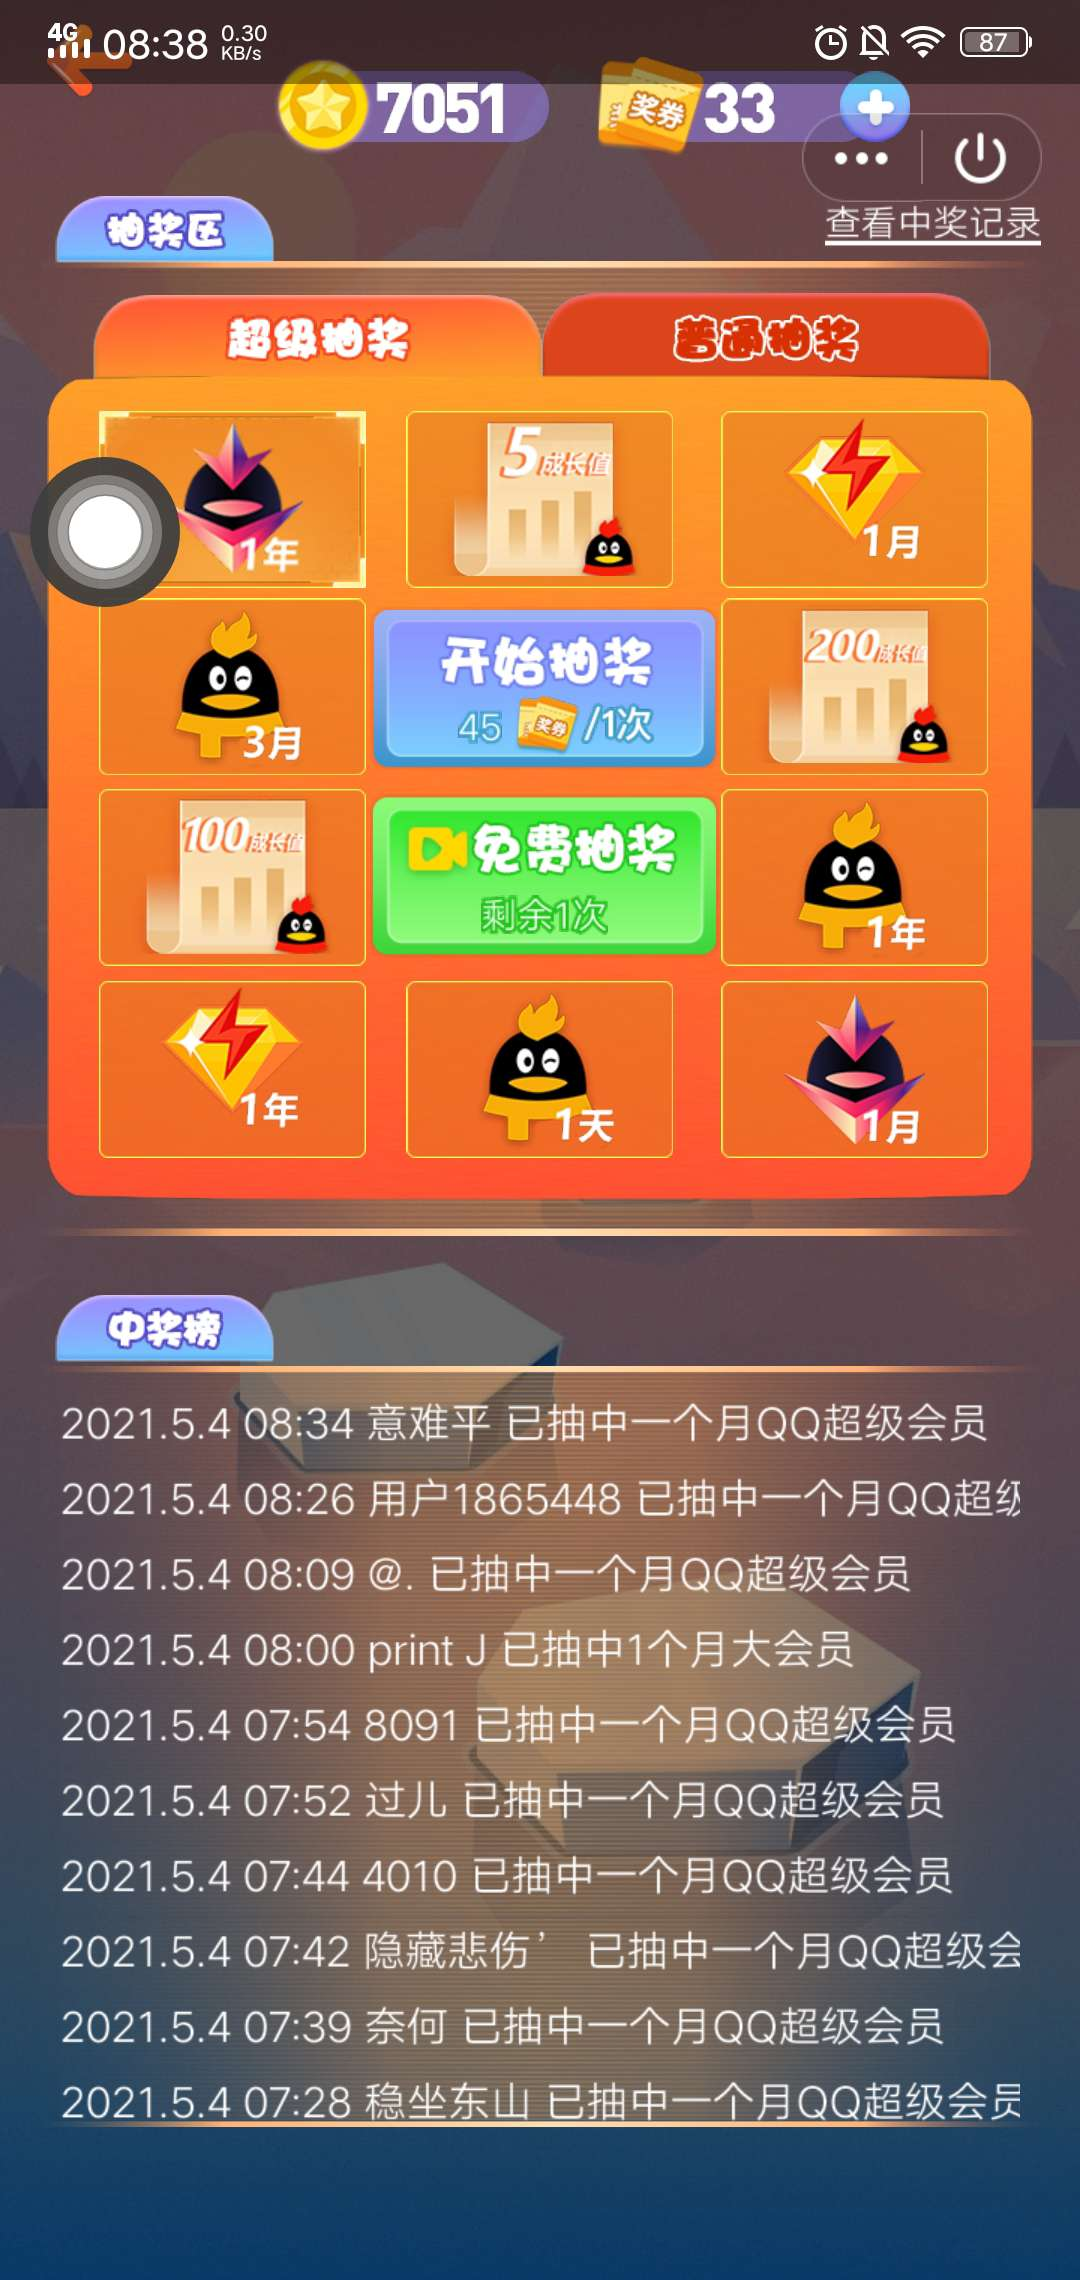 QQ小程序每周免费领取超级会员